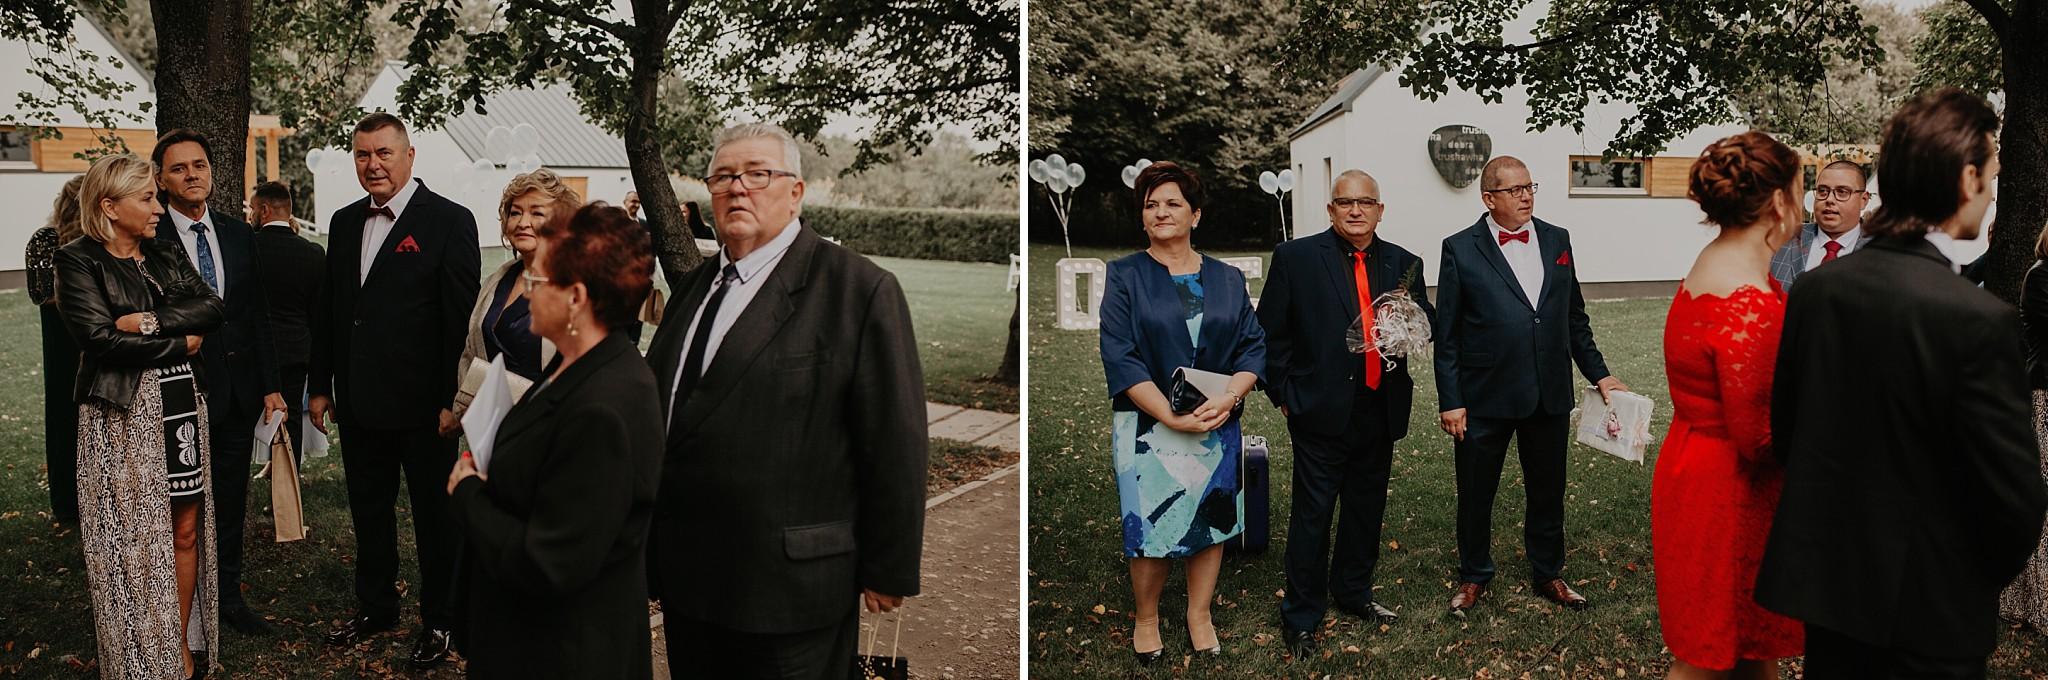 fotograf poznan wesele dobra truskawka piekne wesele pod poznaniem wesele w dobrej truskawce piekna para mloda slub marzen slub koronawirus slub listopad wesele koronawirus 252